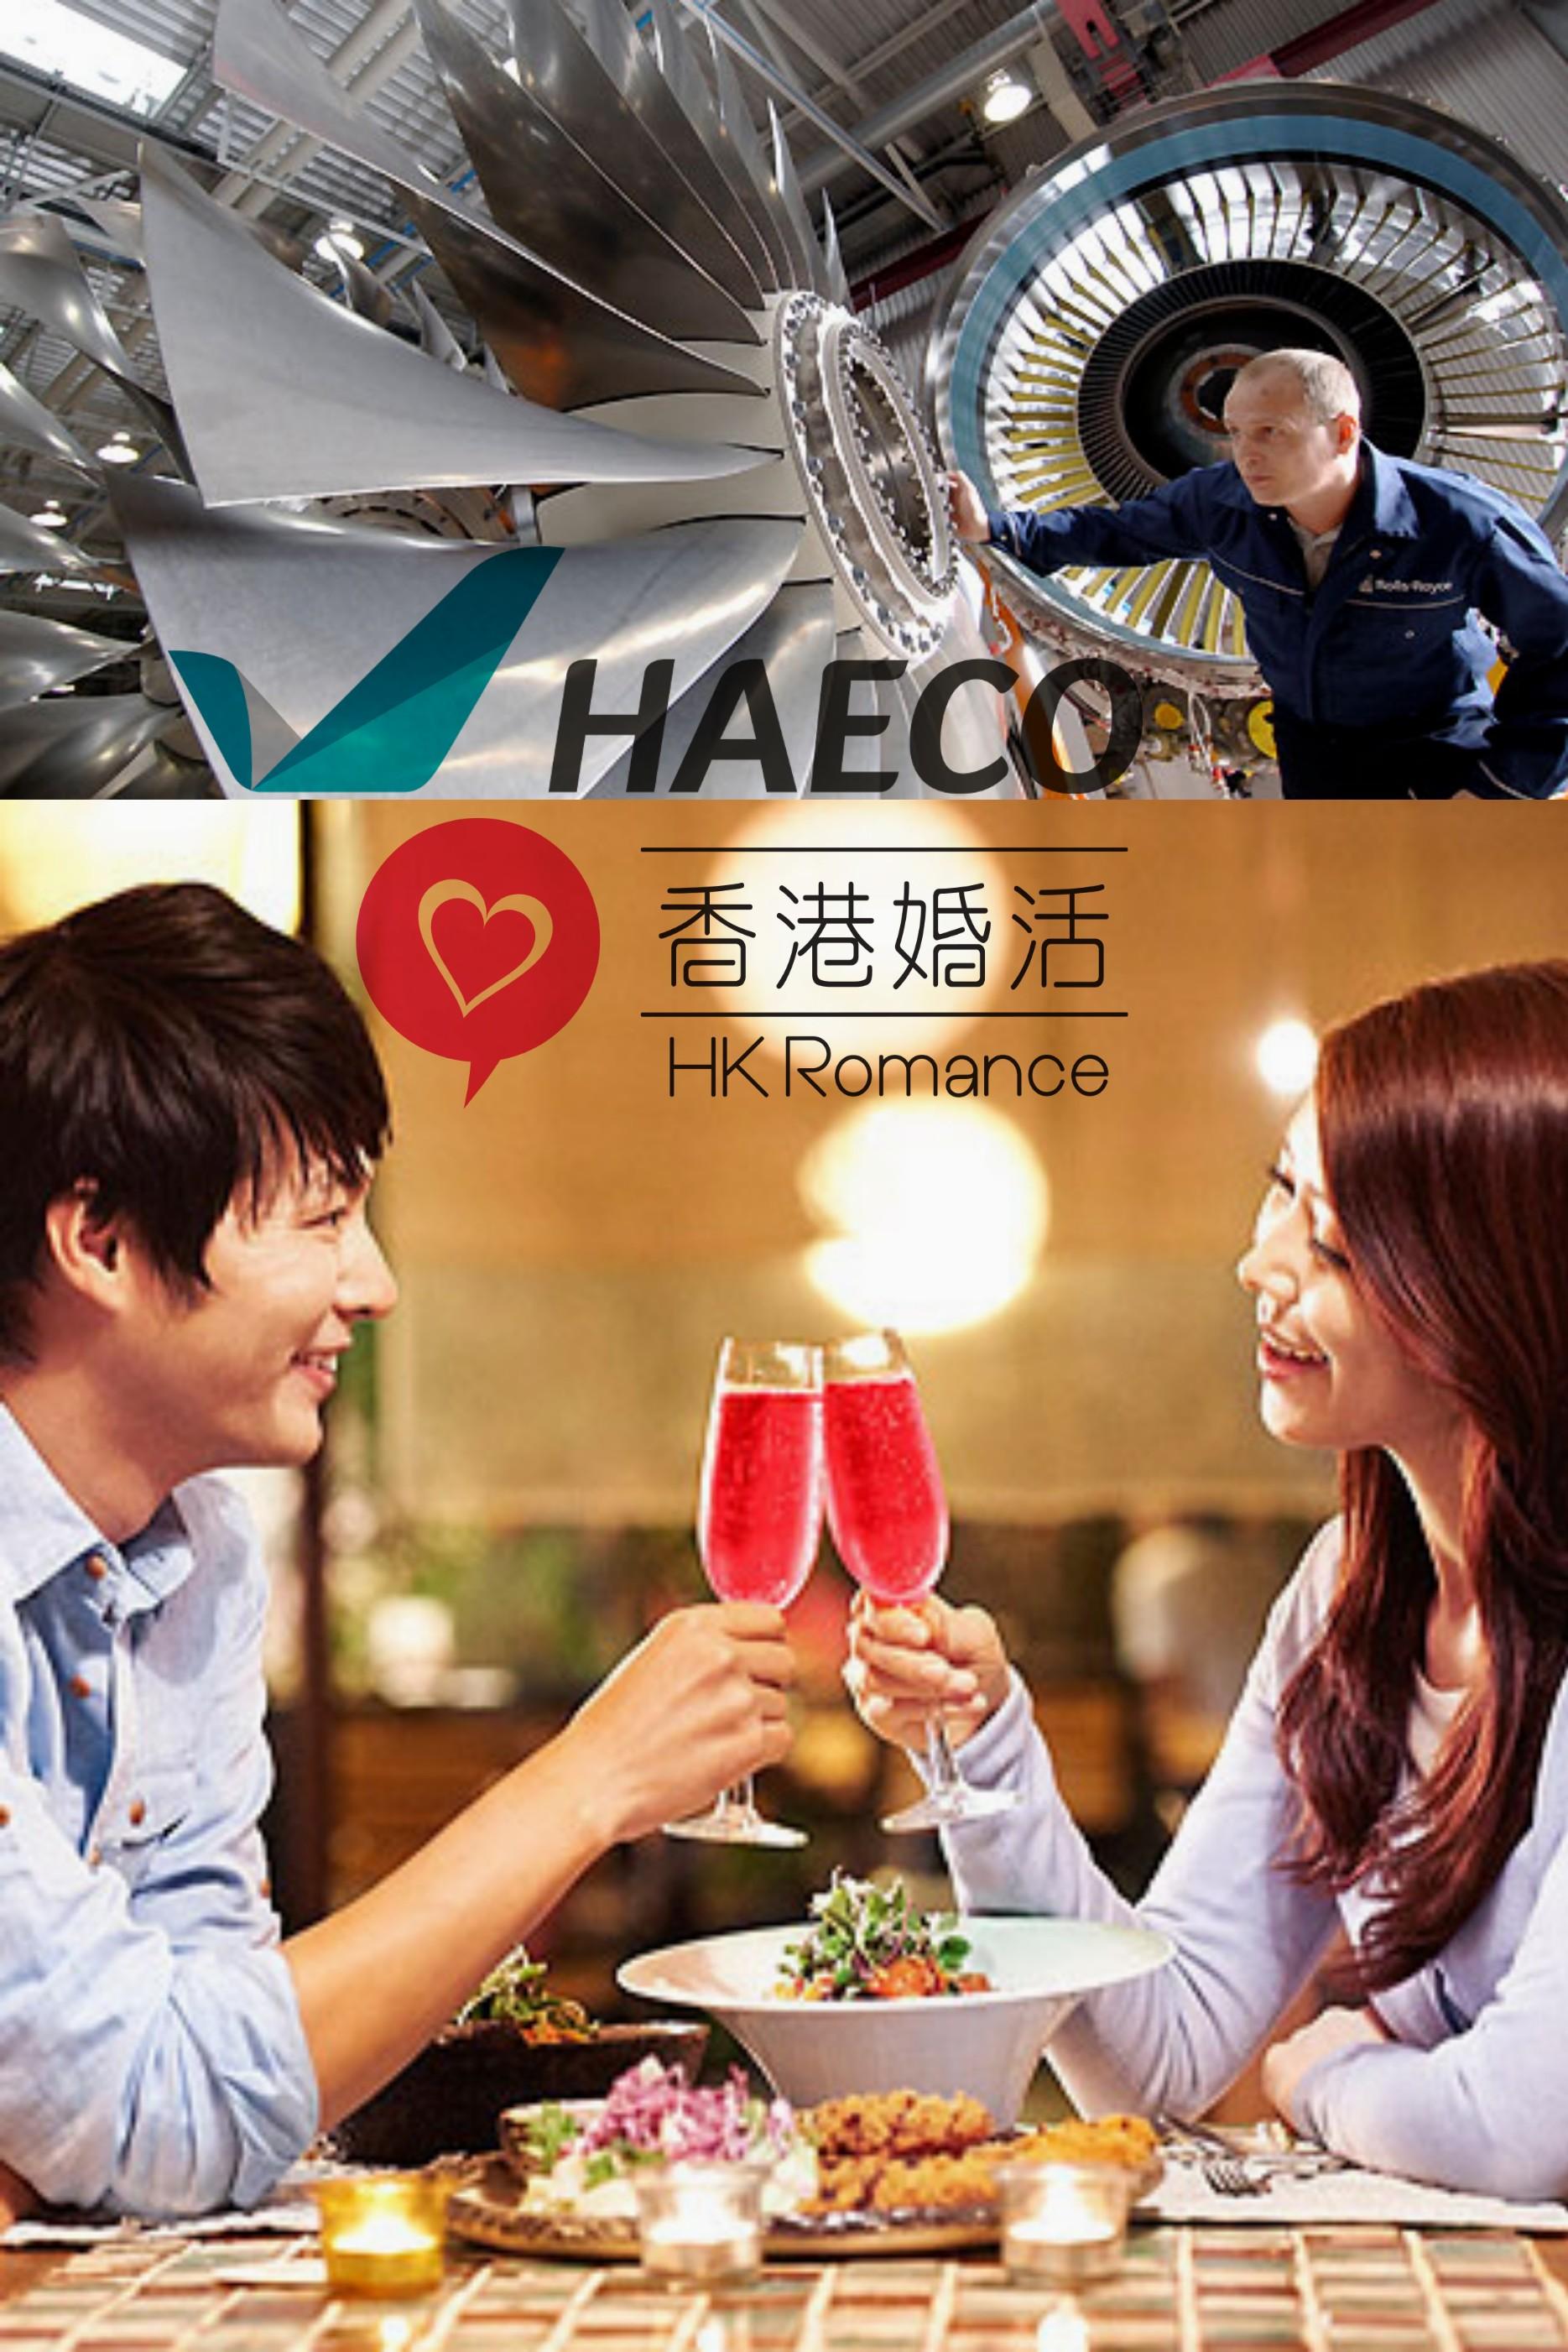 HK Romance Dating | 專業 Speed Dating 及單對單約會 Matching